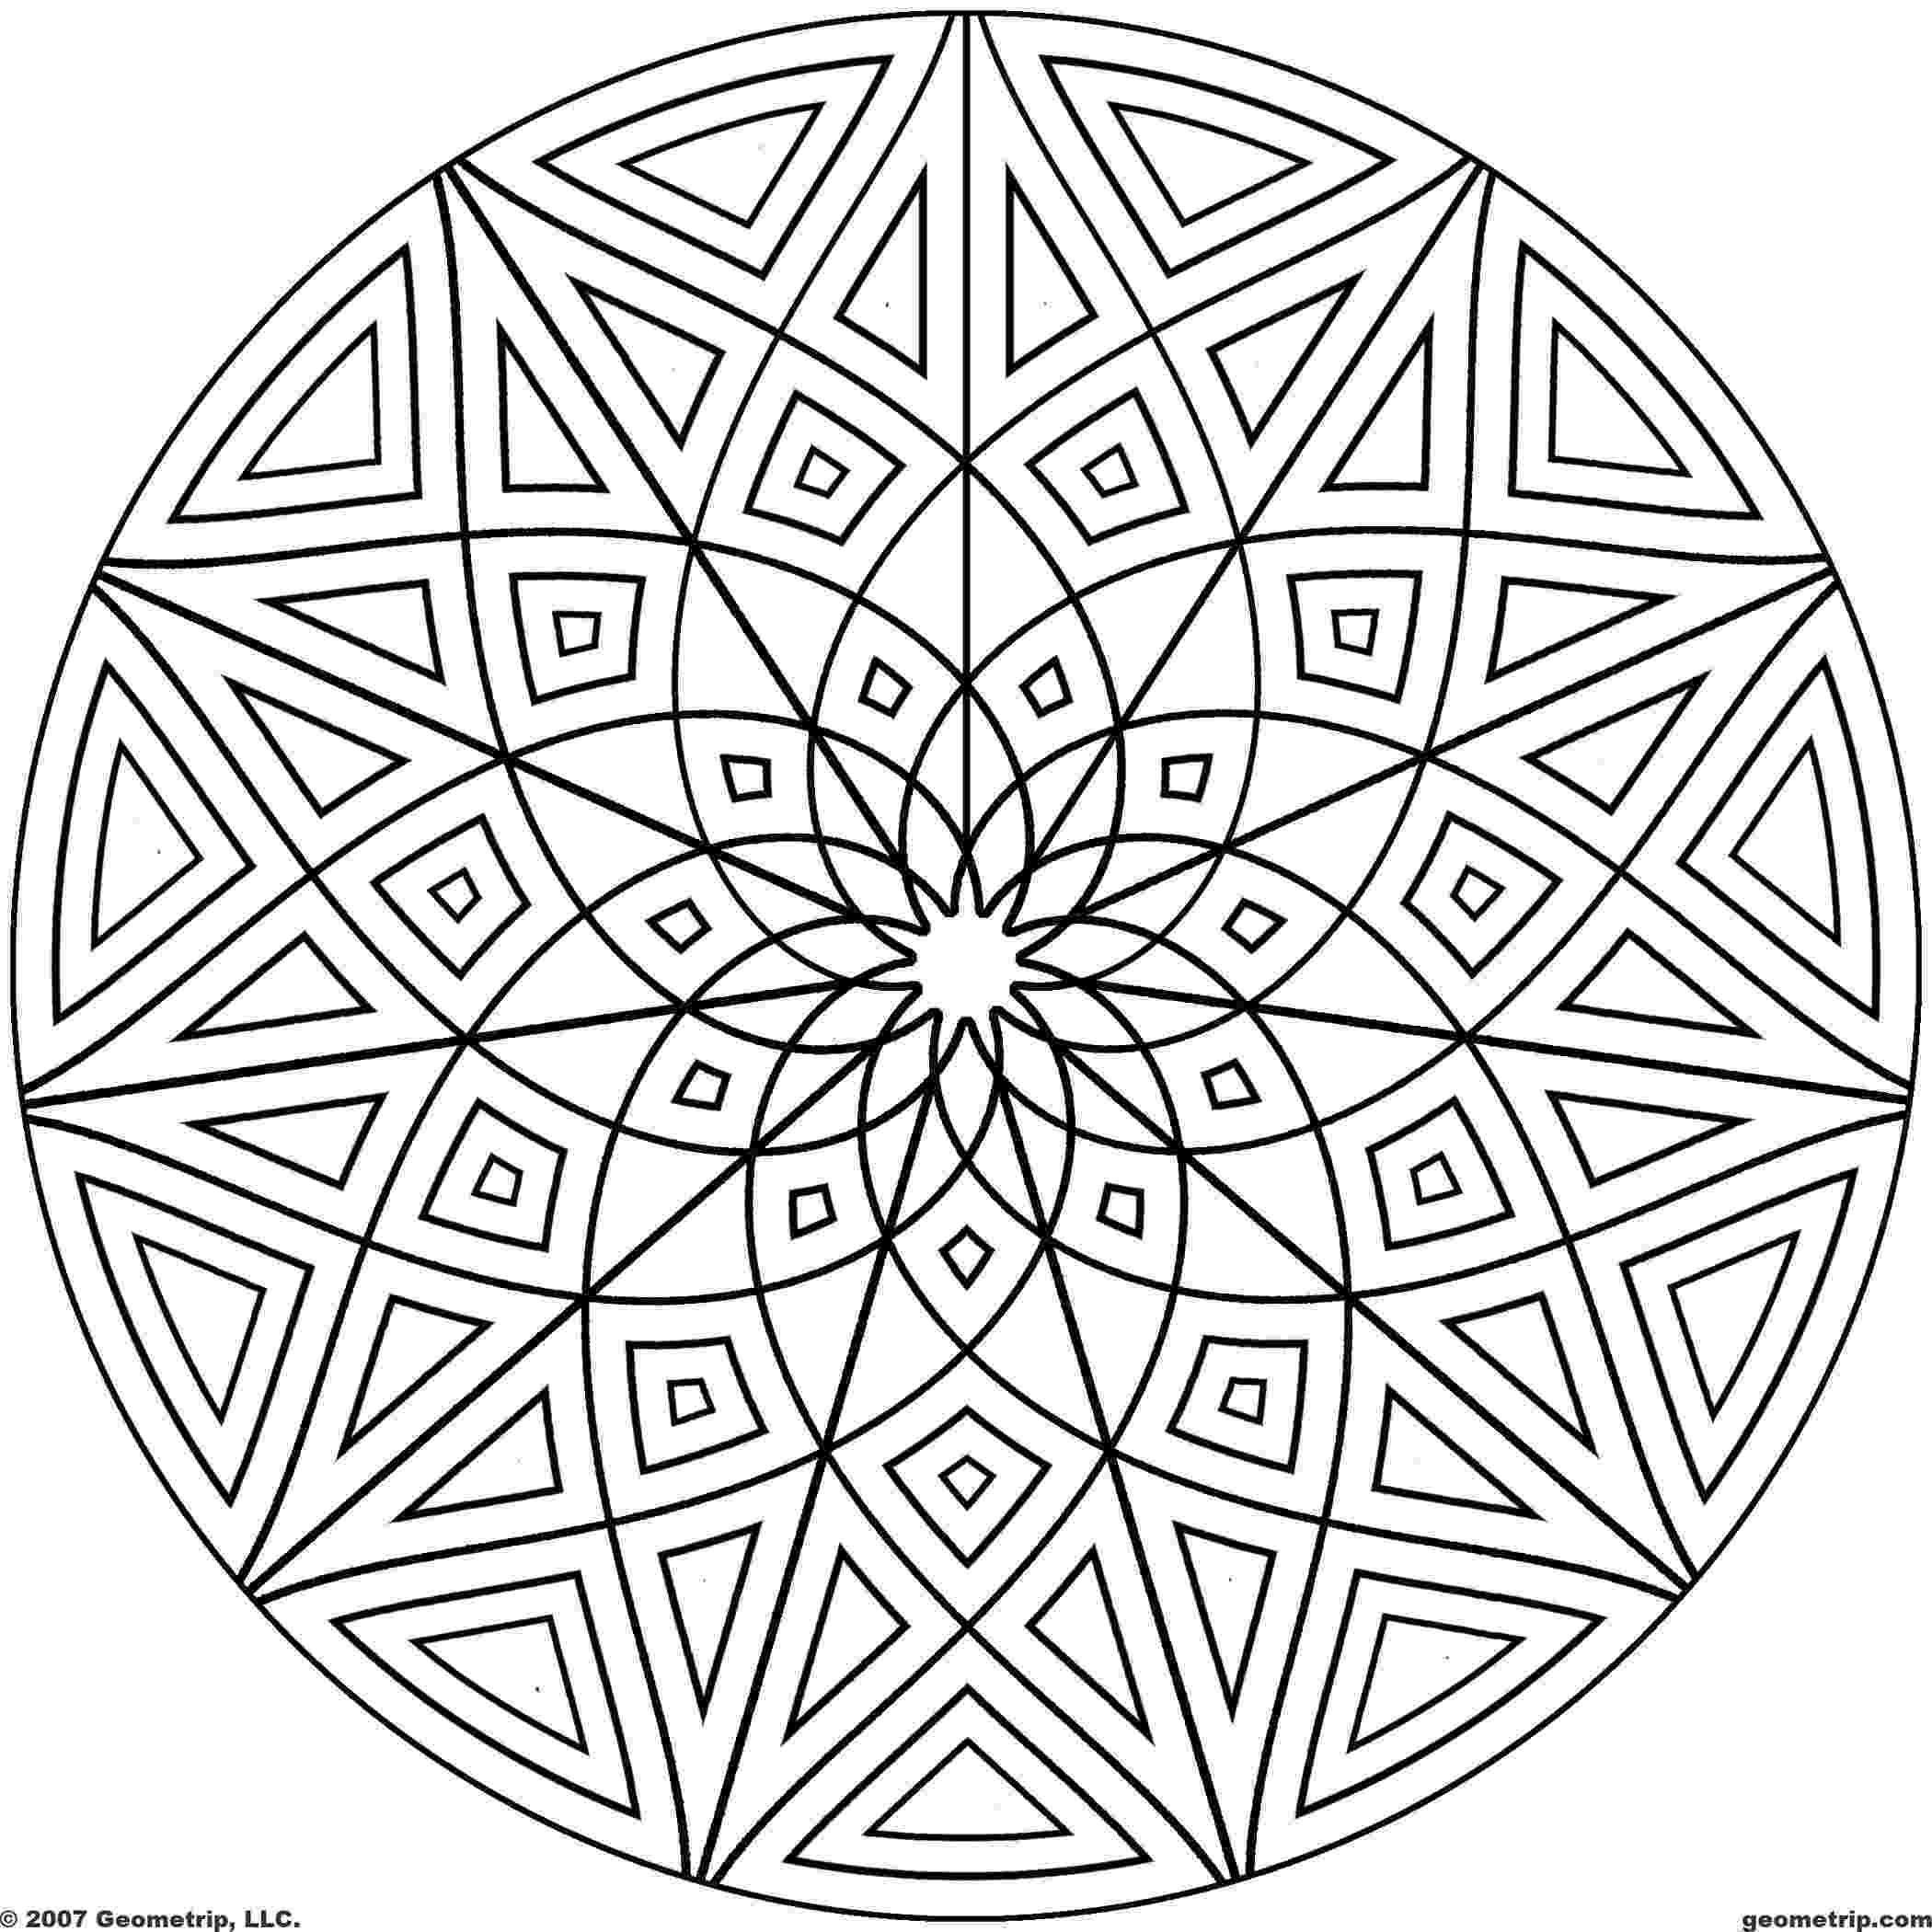 kaleidoscope colouring patterns printable kaleidoscope coloring pages for kids cool2bkids patterns colouring kaleidoscope 1 1